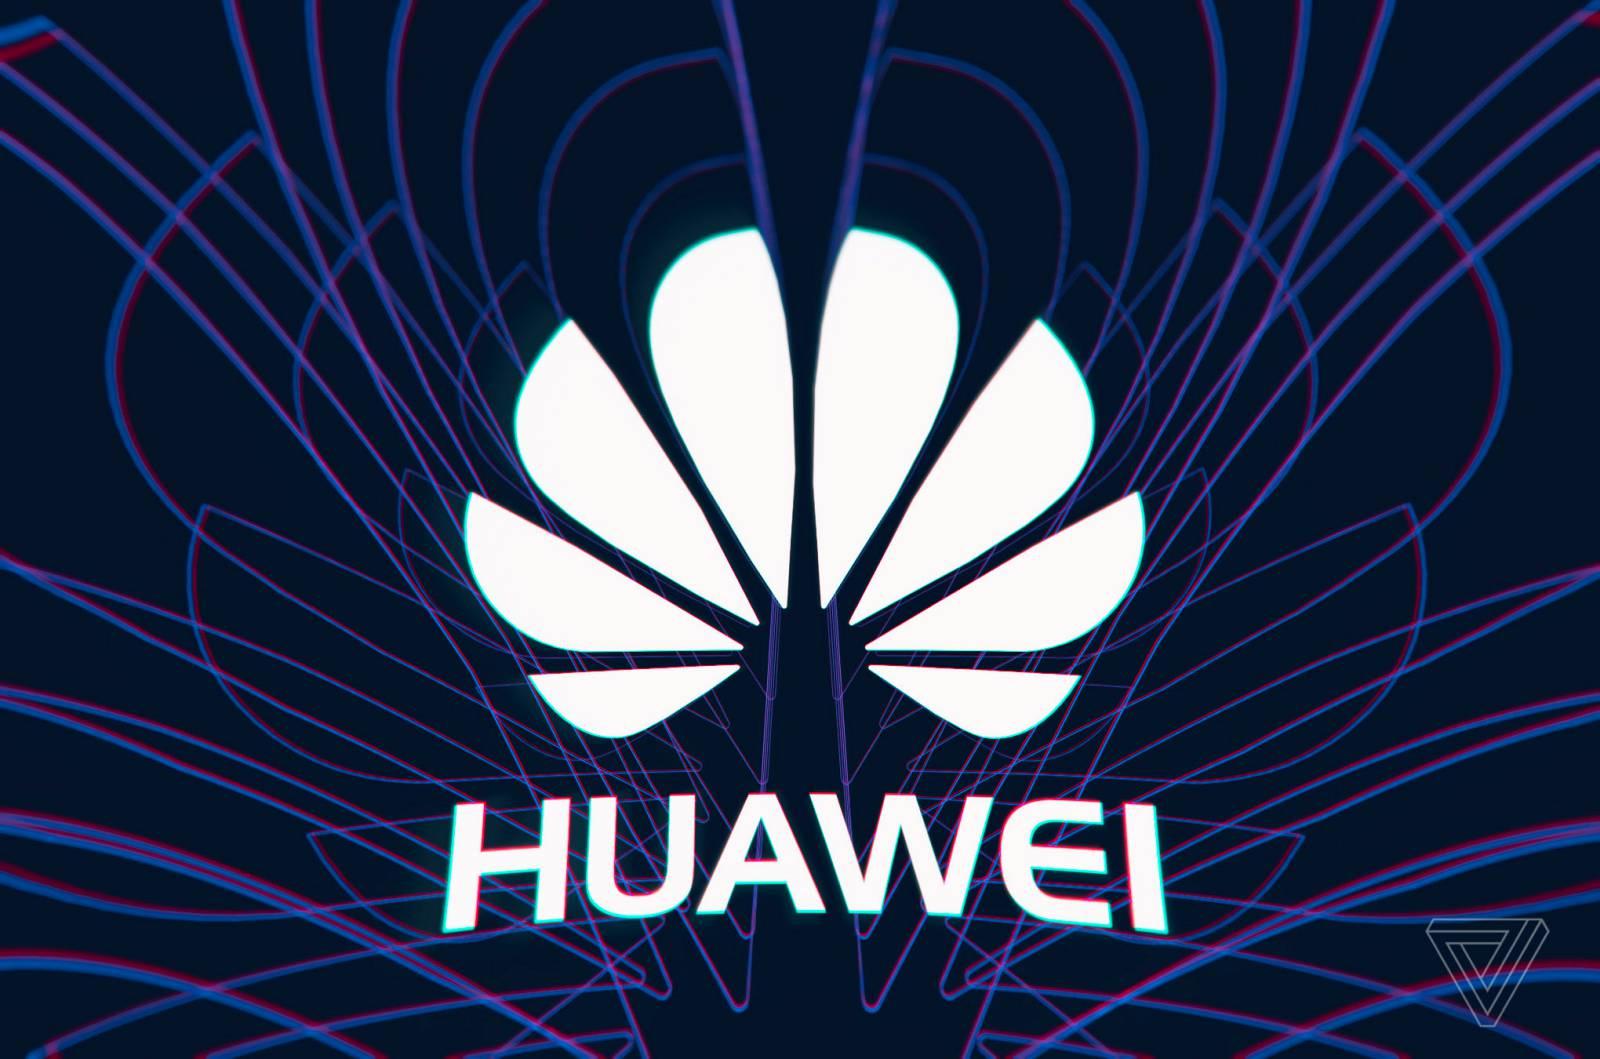 Huawei westminster